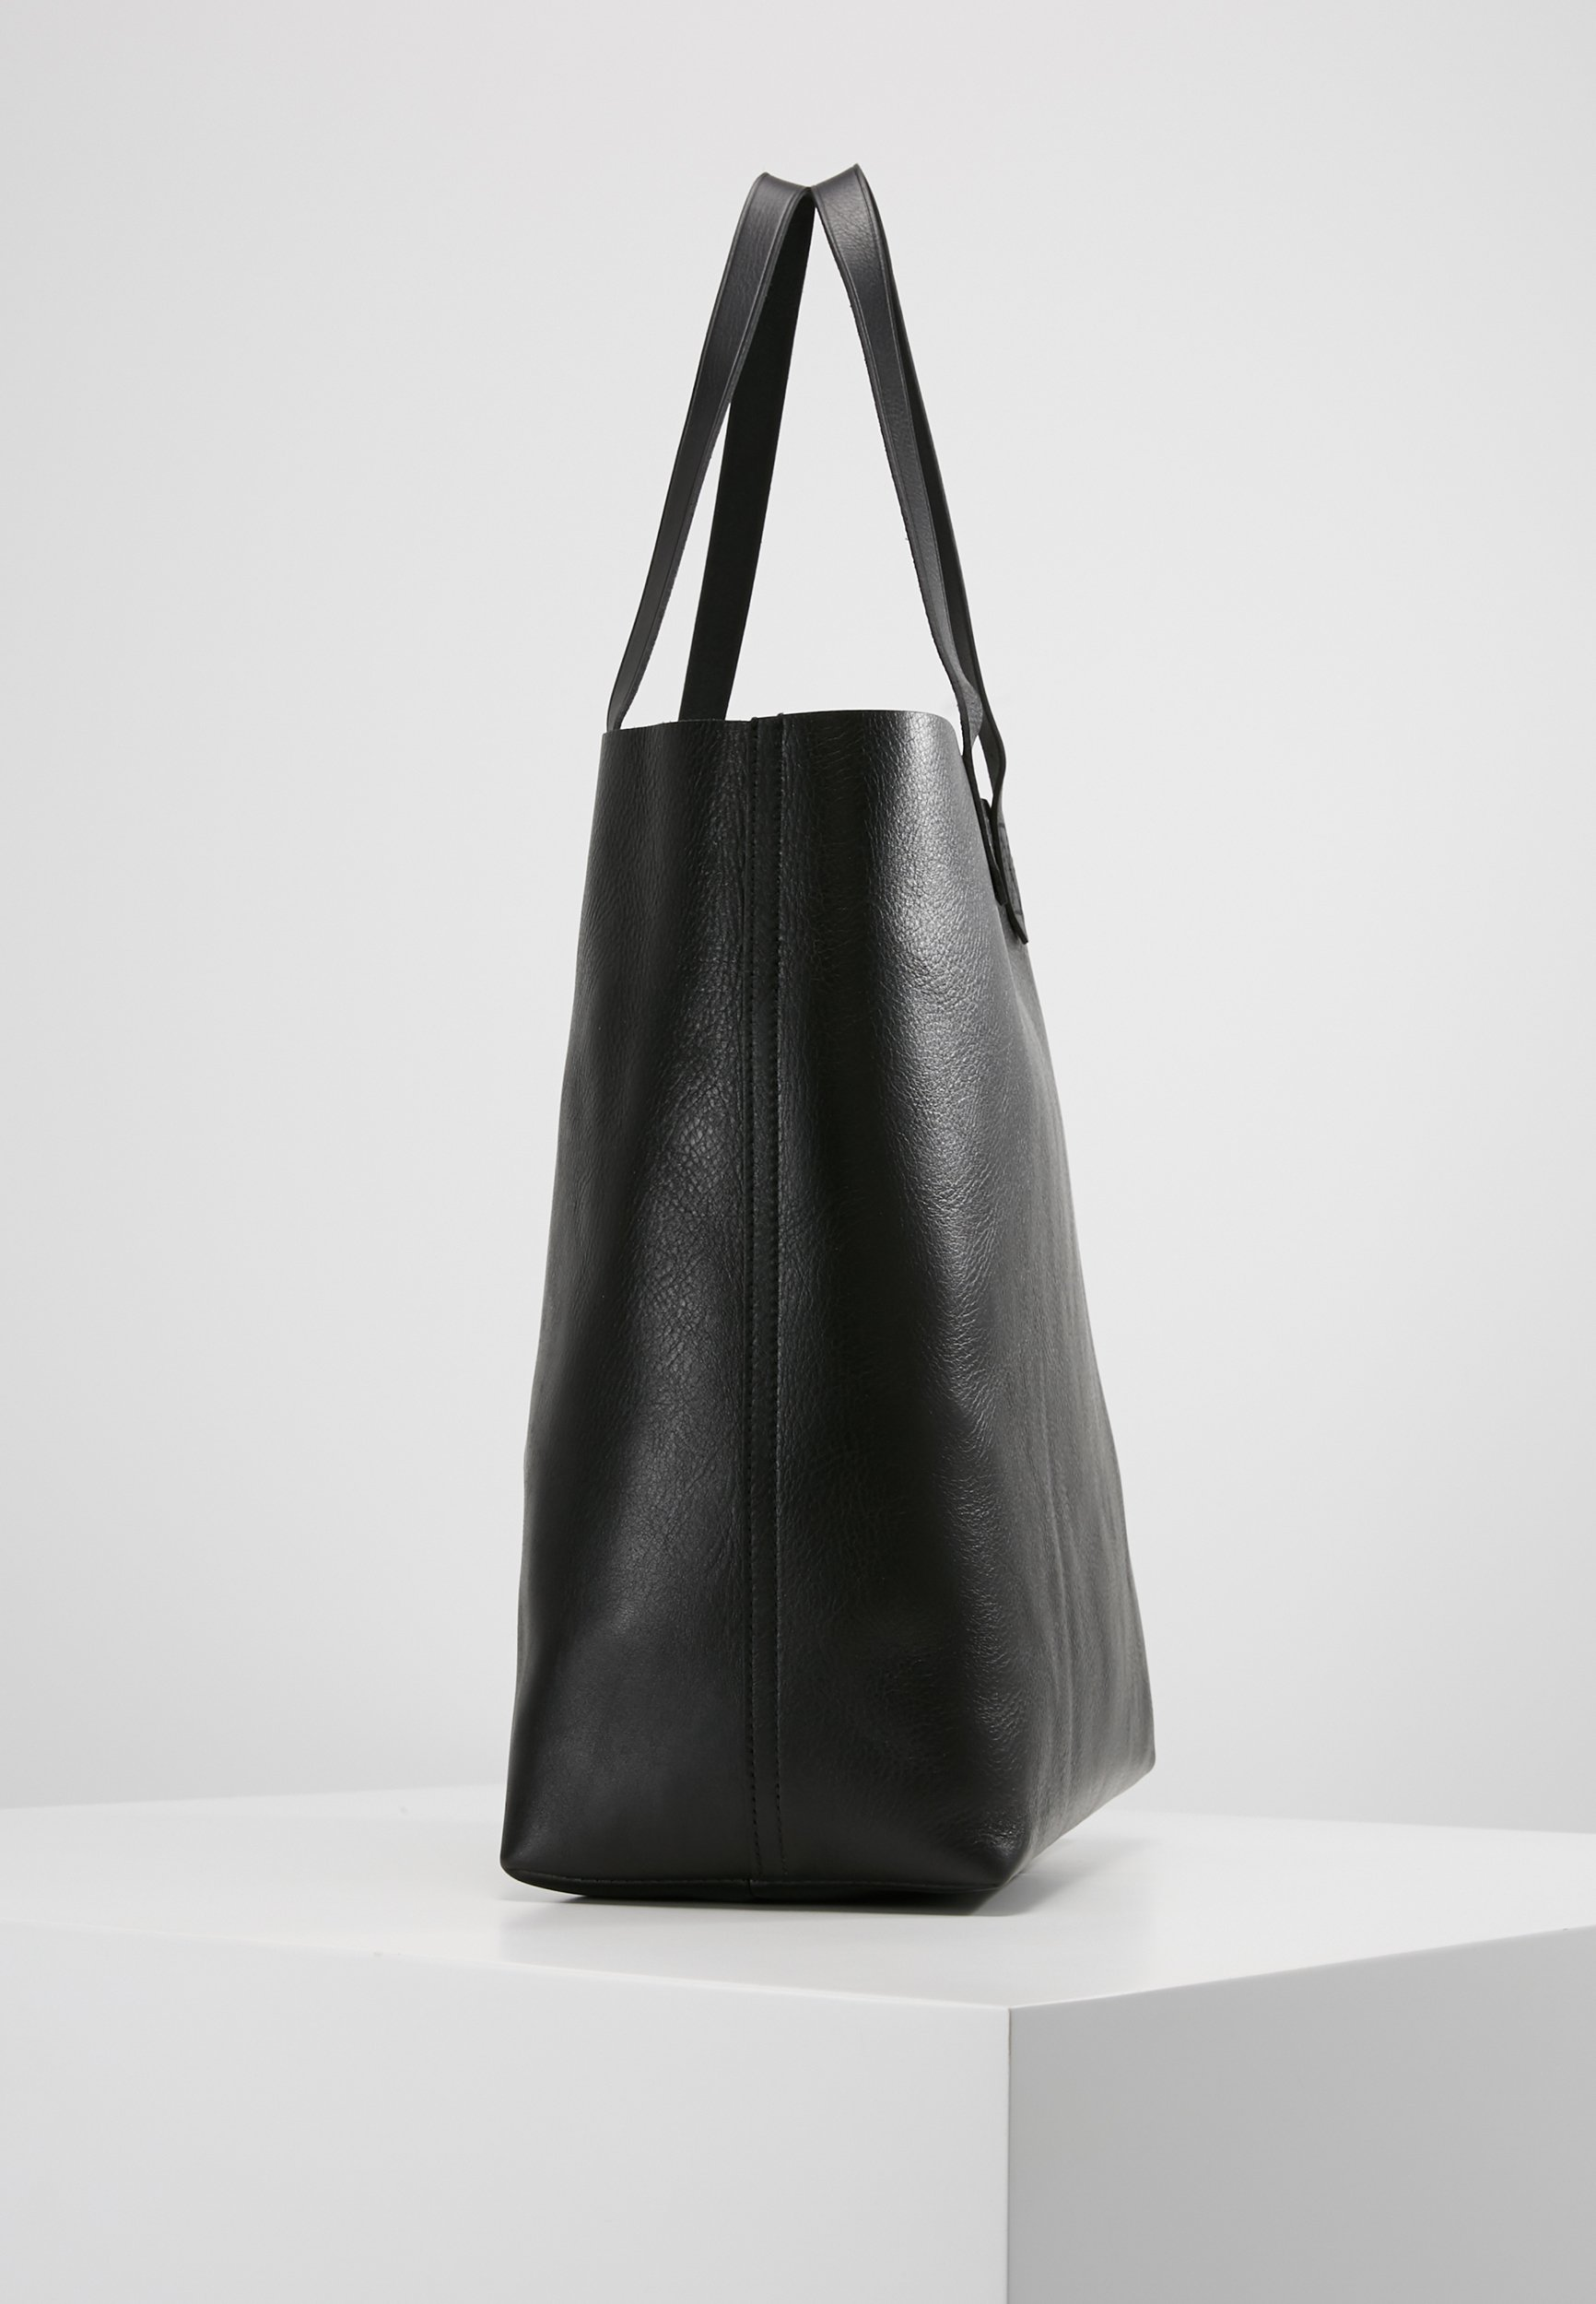 THE TRANSPORT TOTE Shopping Bag true black